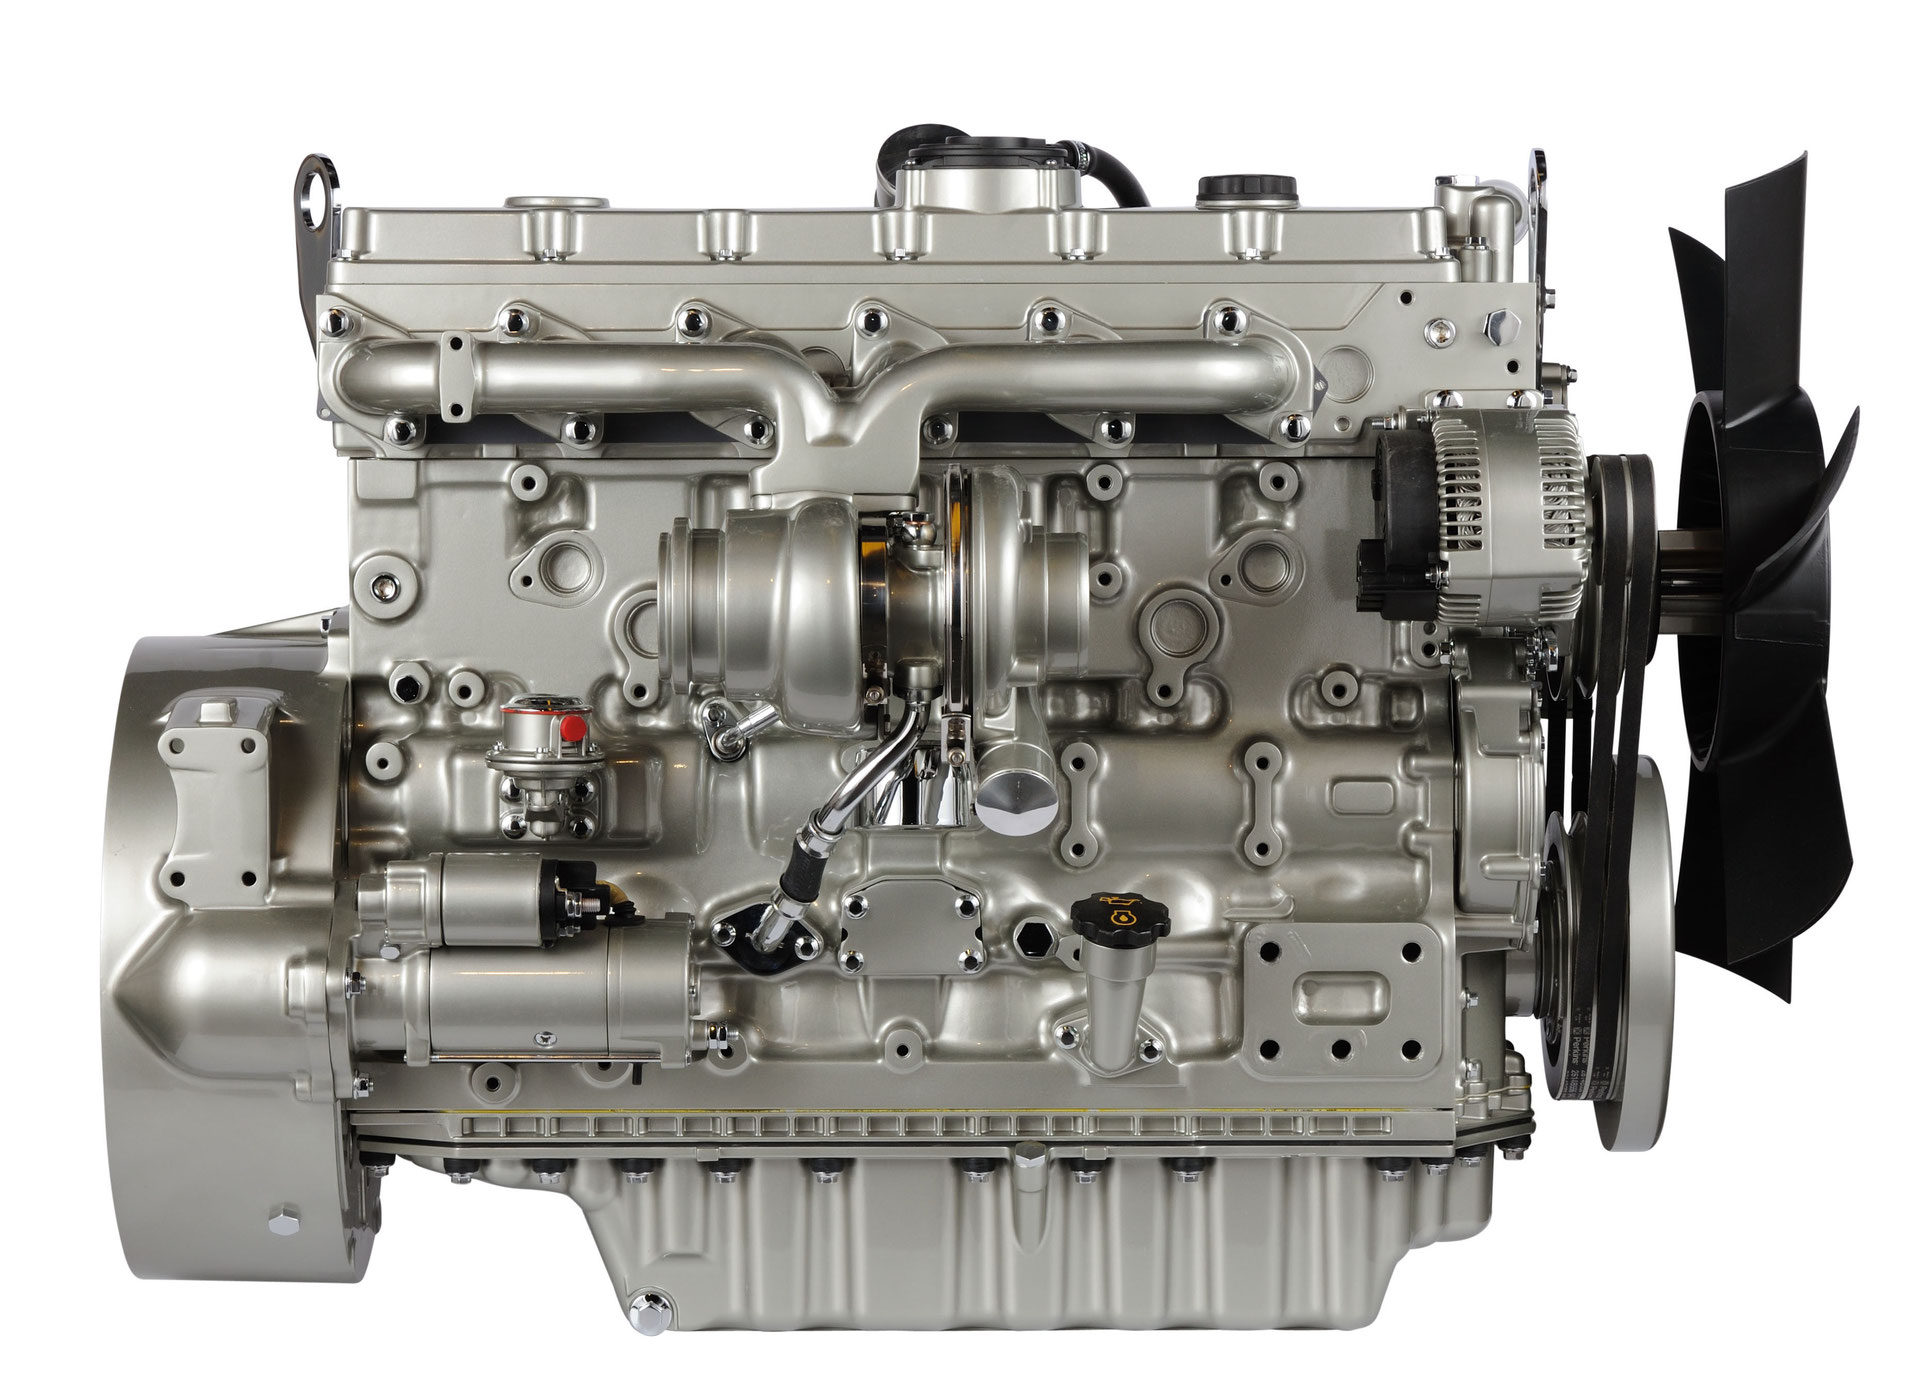 perkins engine wiring diagram - pontiac aztek tcc wiring diagram -  fiats128.tukune.jeanjaures37.fr  wiring diagram resource